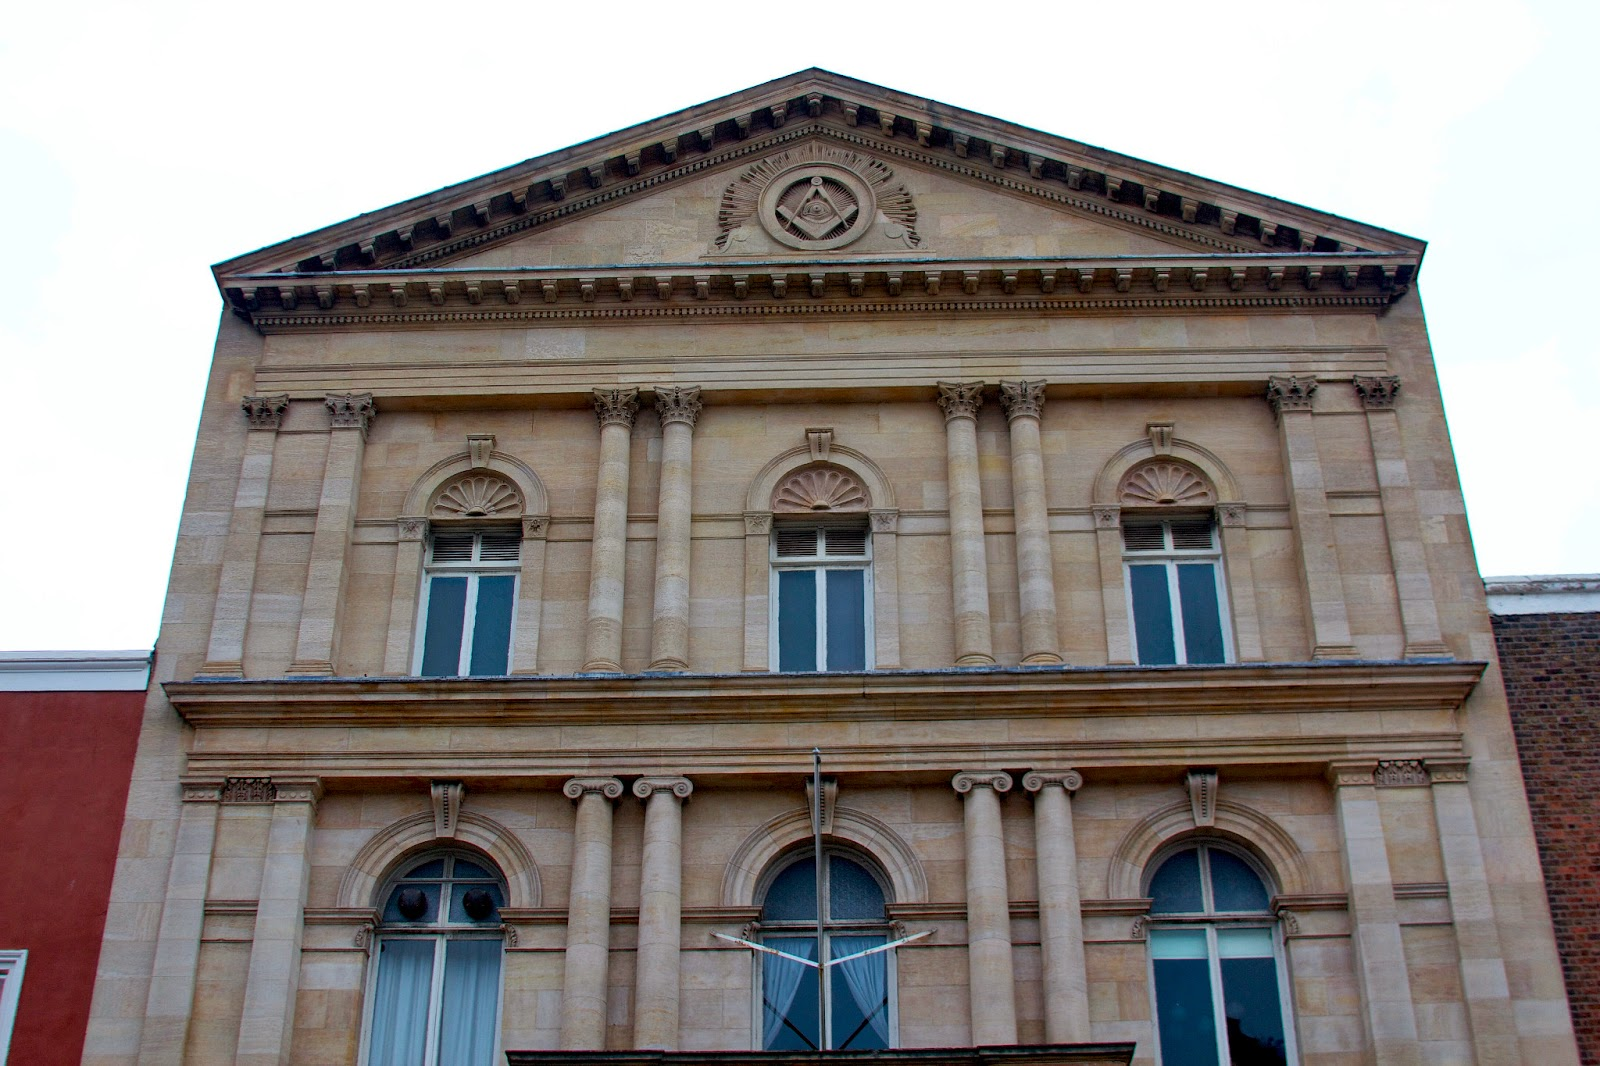 grand lodge of ireland freemasons revealed grand